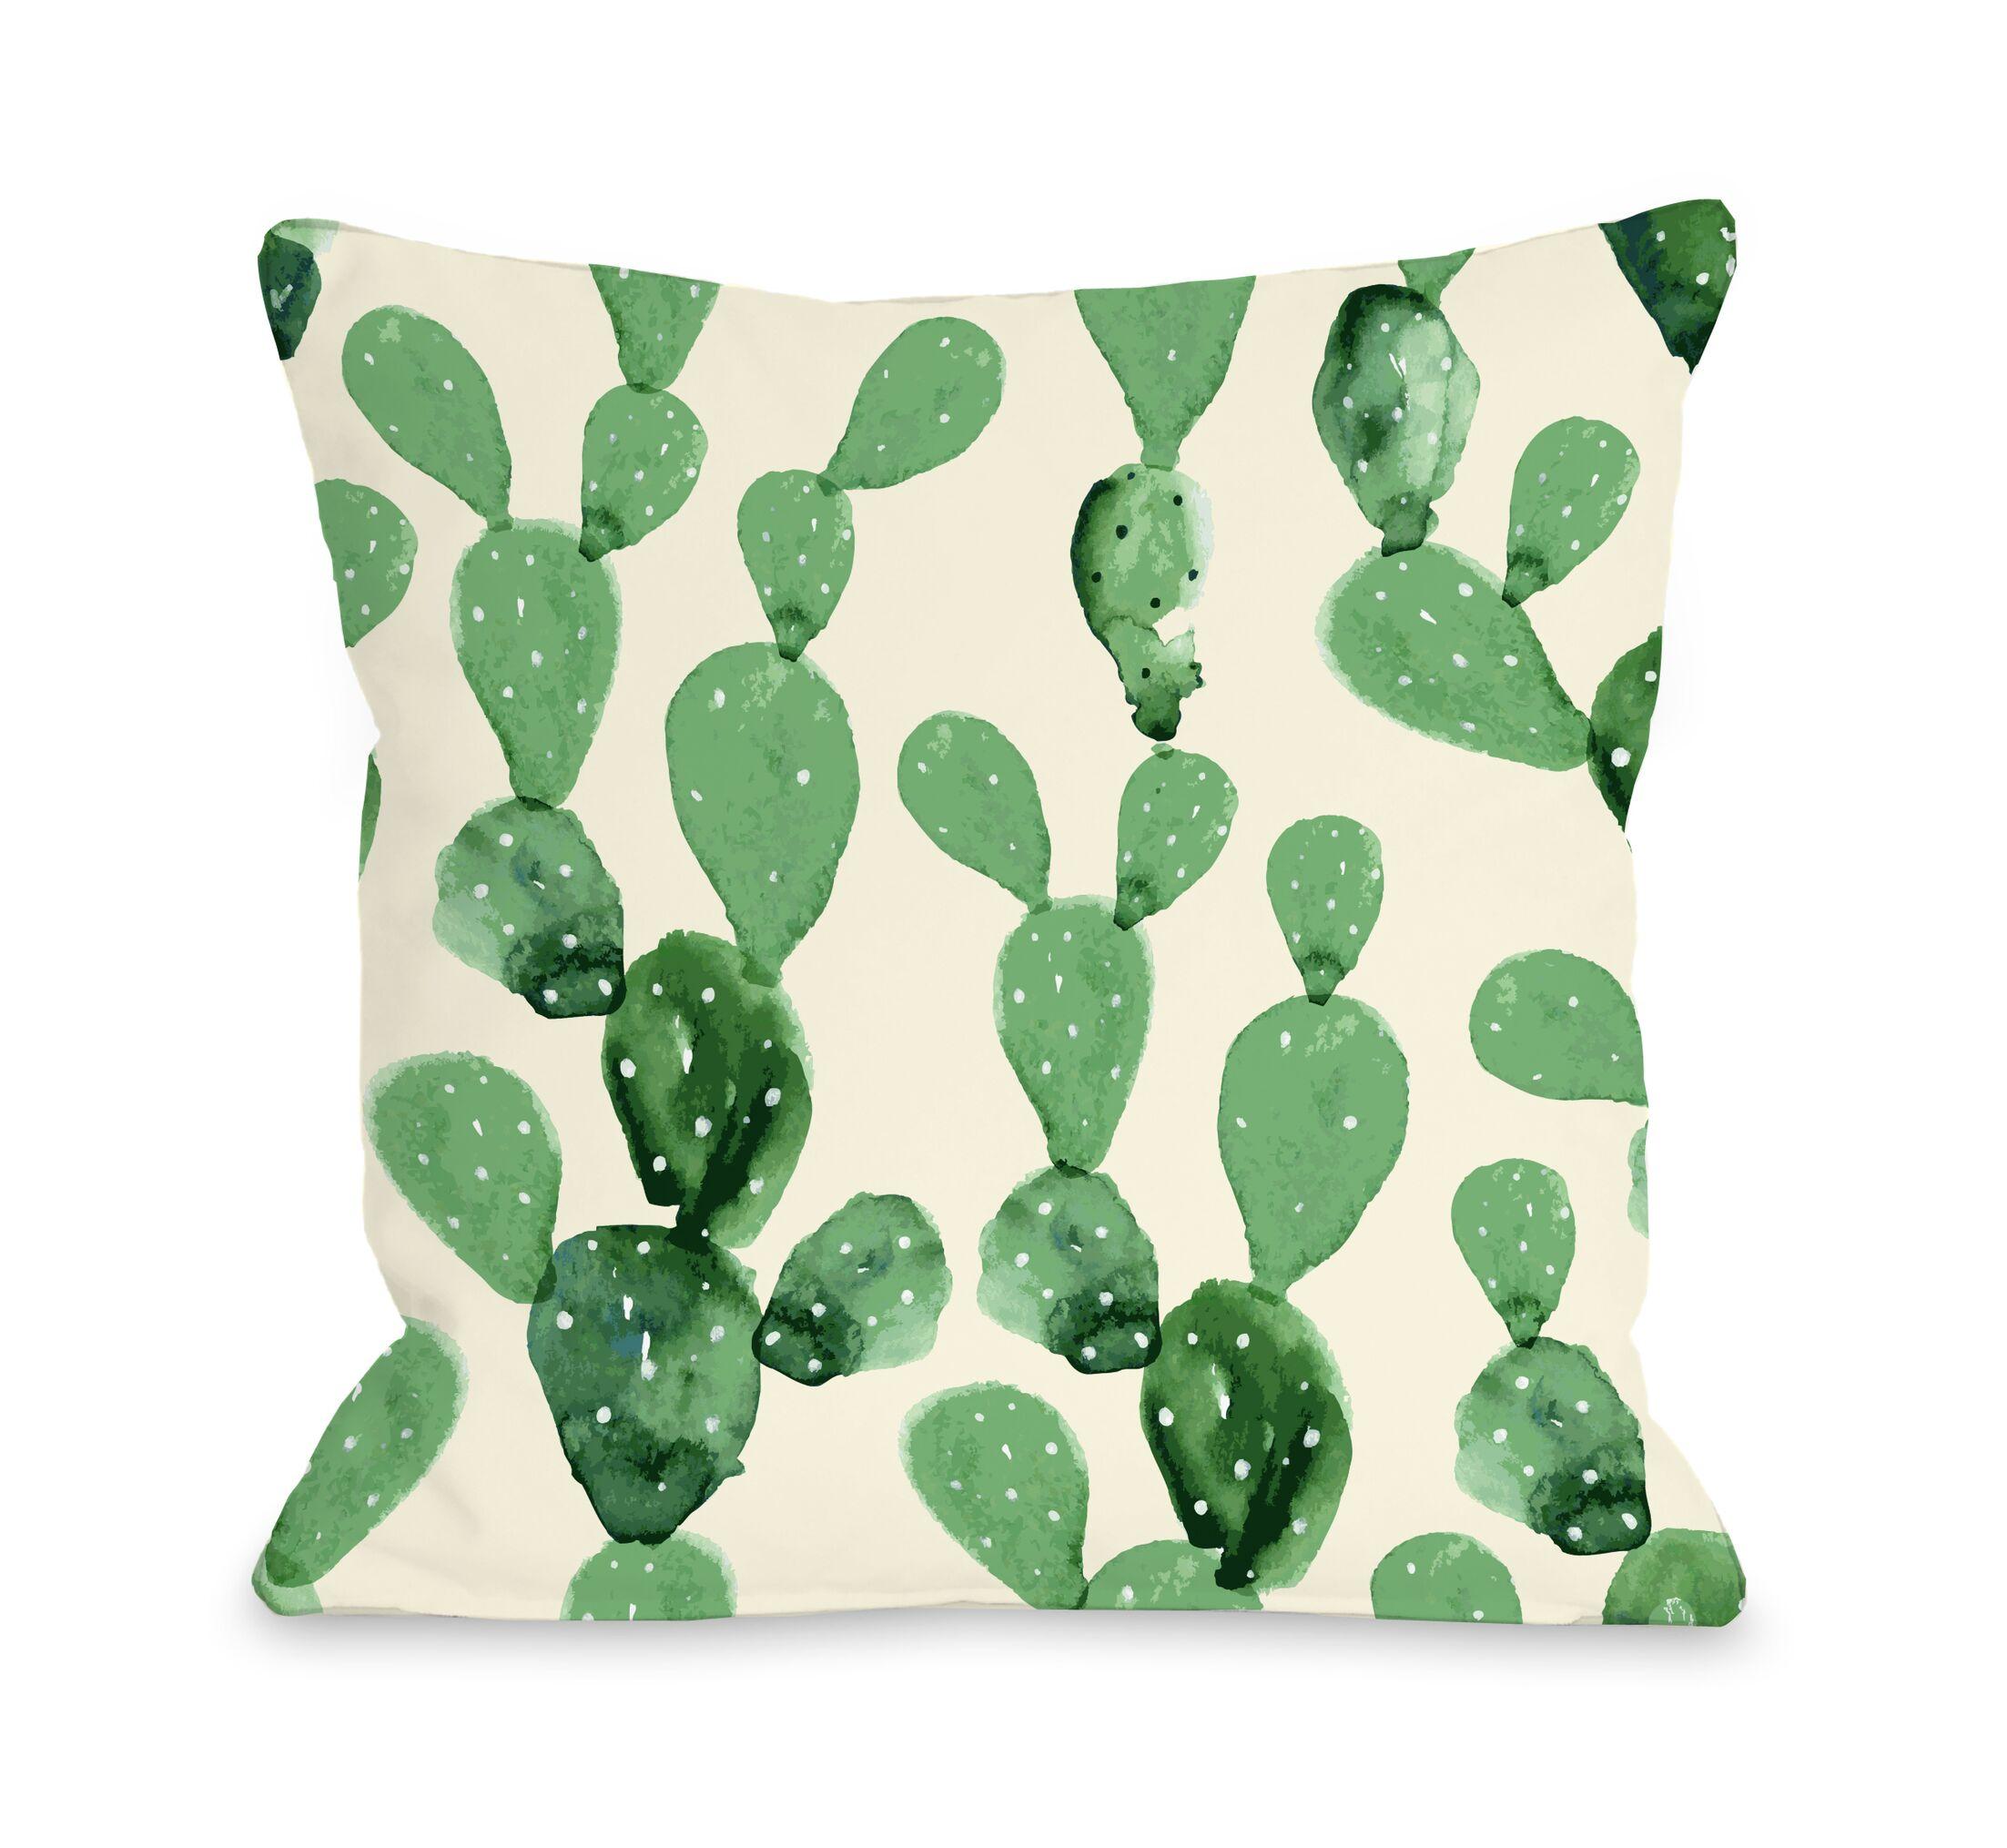 Dovercourt Cacti Columns Outdoor Throw Pillow Size: 16